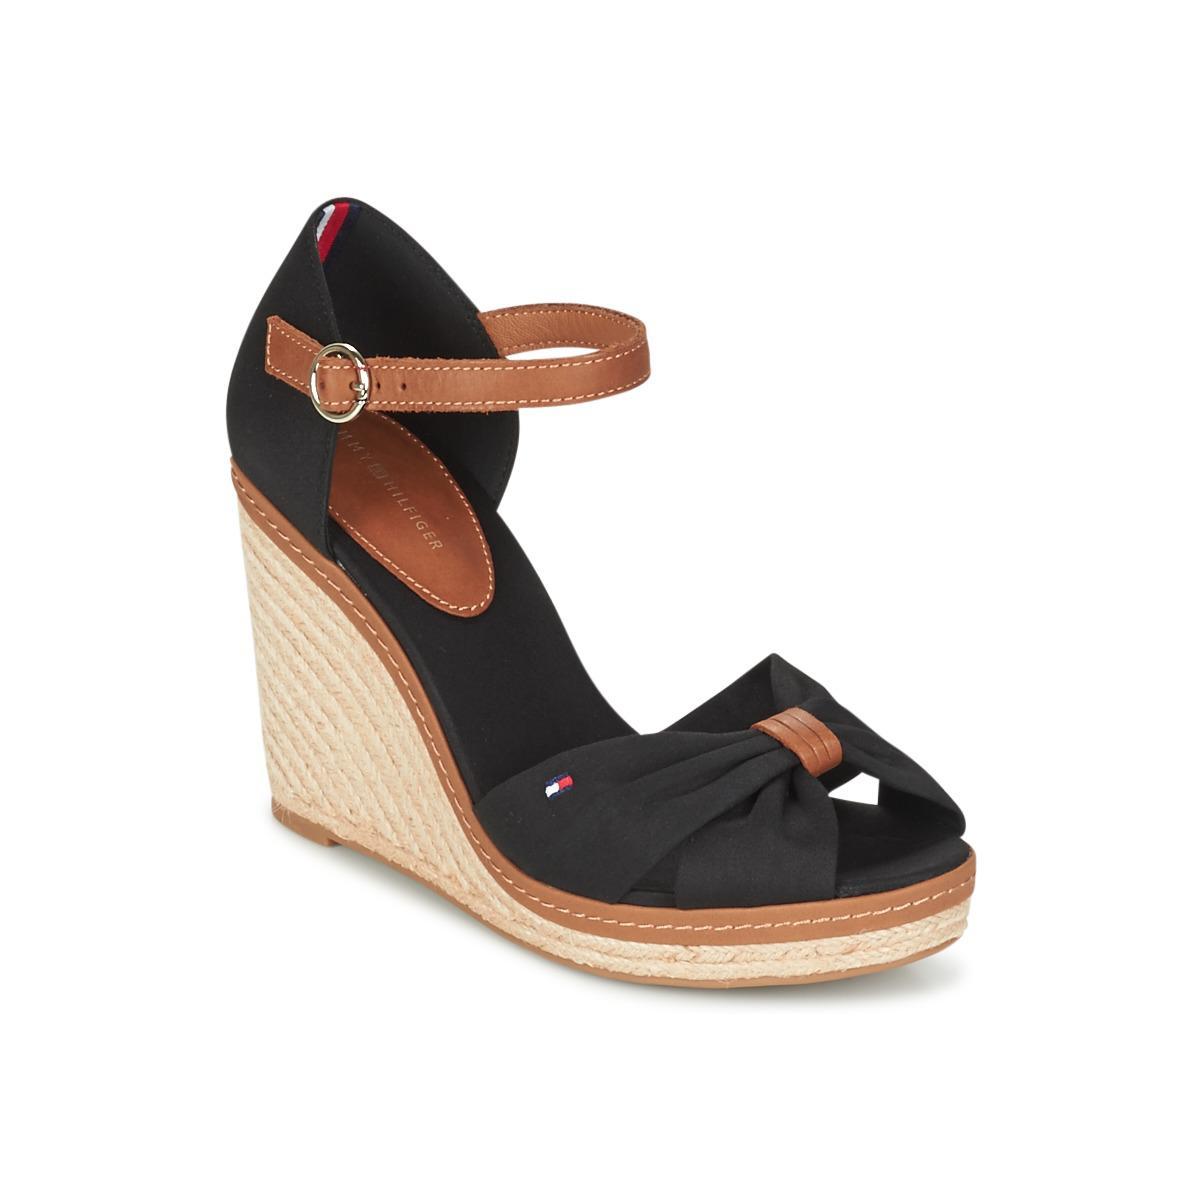 71002dc698ad Tommy Hilfiger Elena 56d Sandals in Black - Lyst